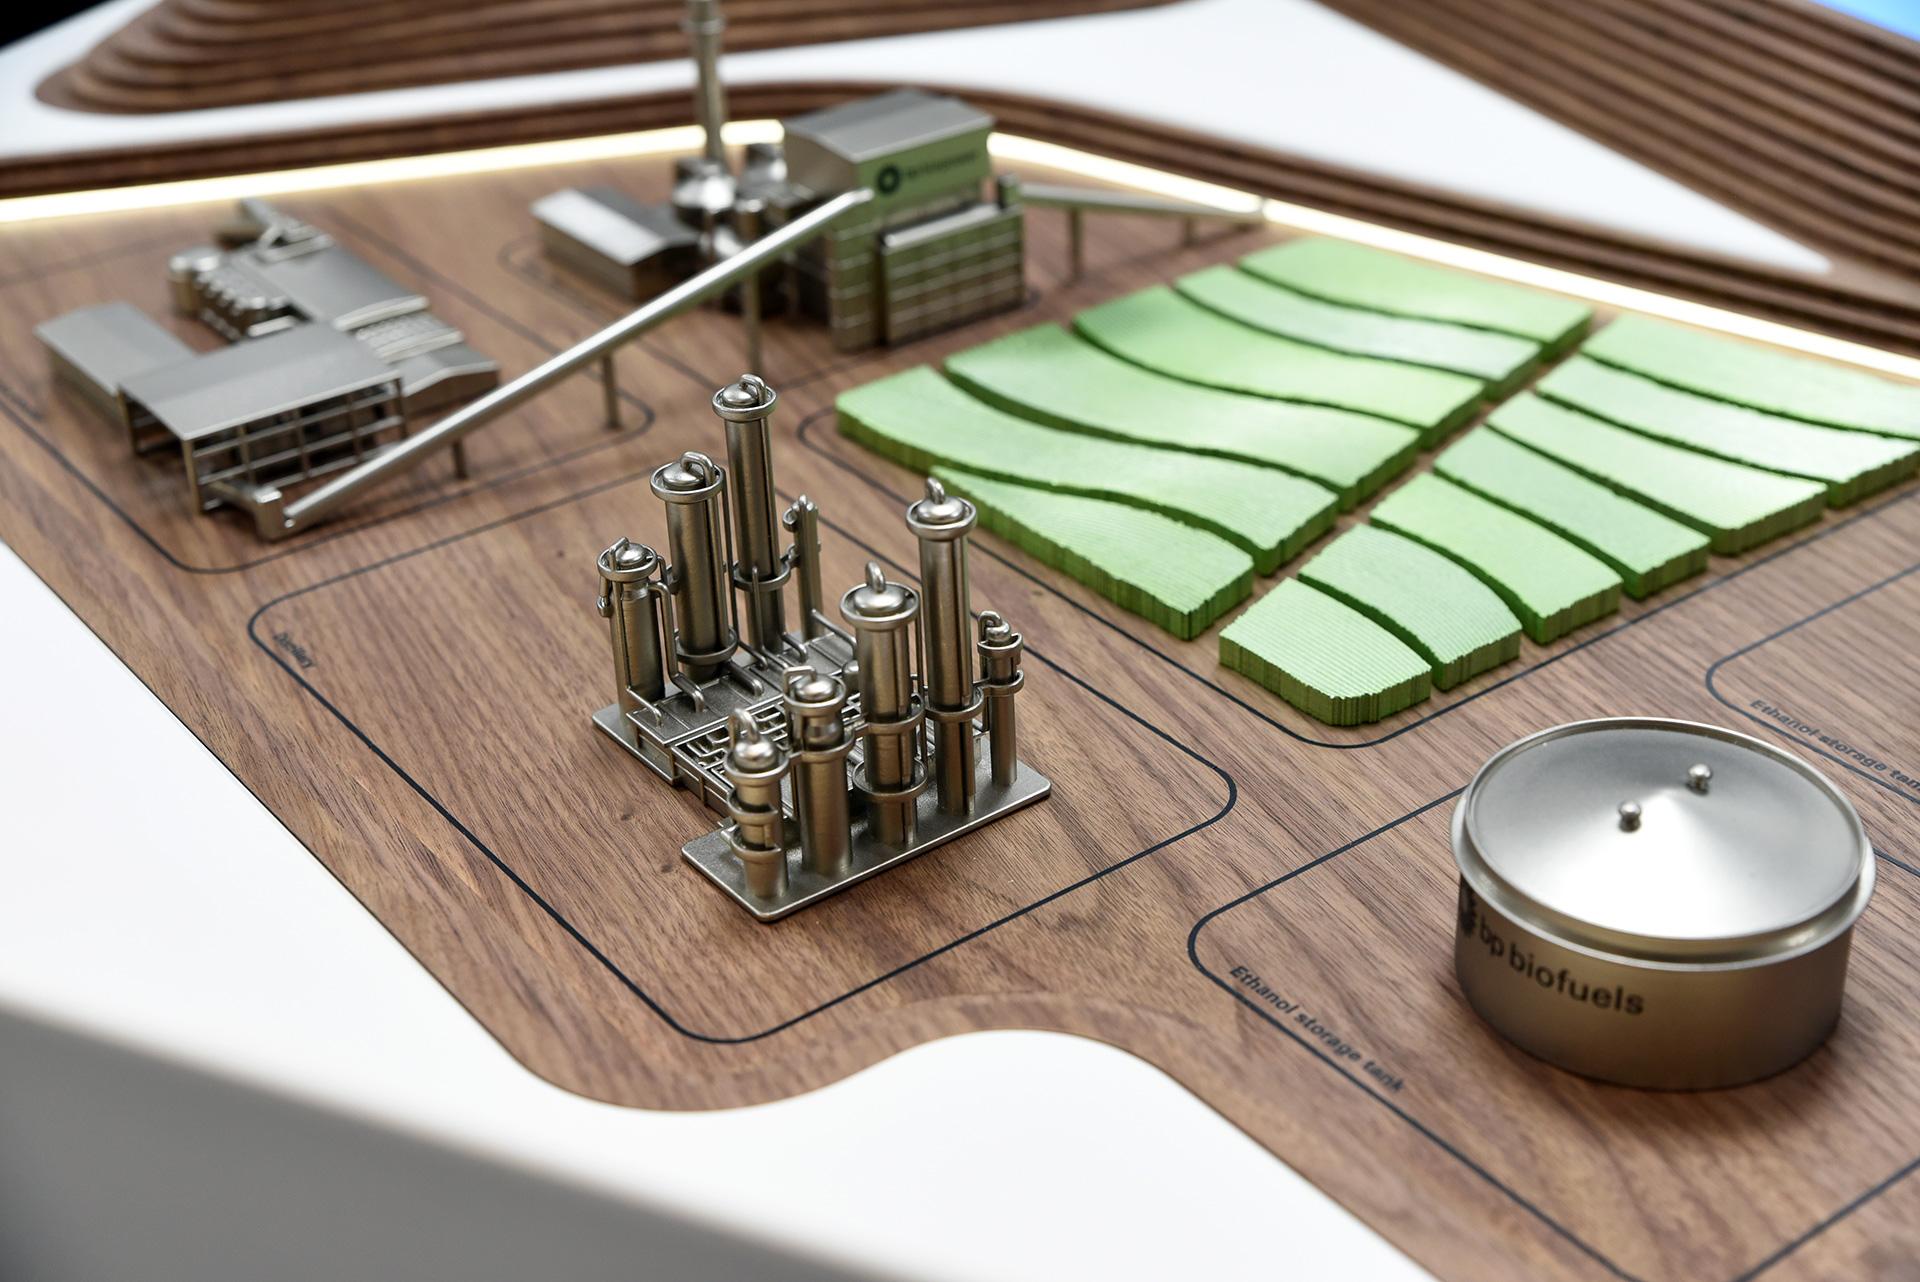 BP-alternative-energy-distillery-prototype.jpg